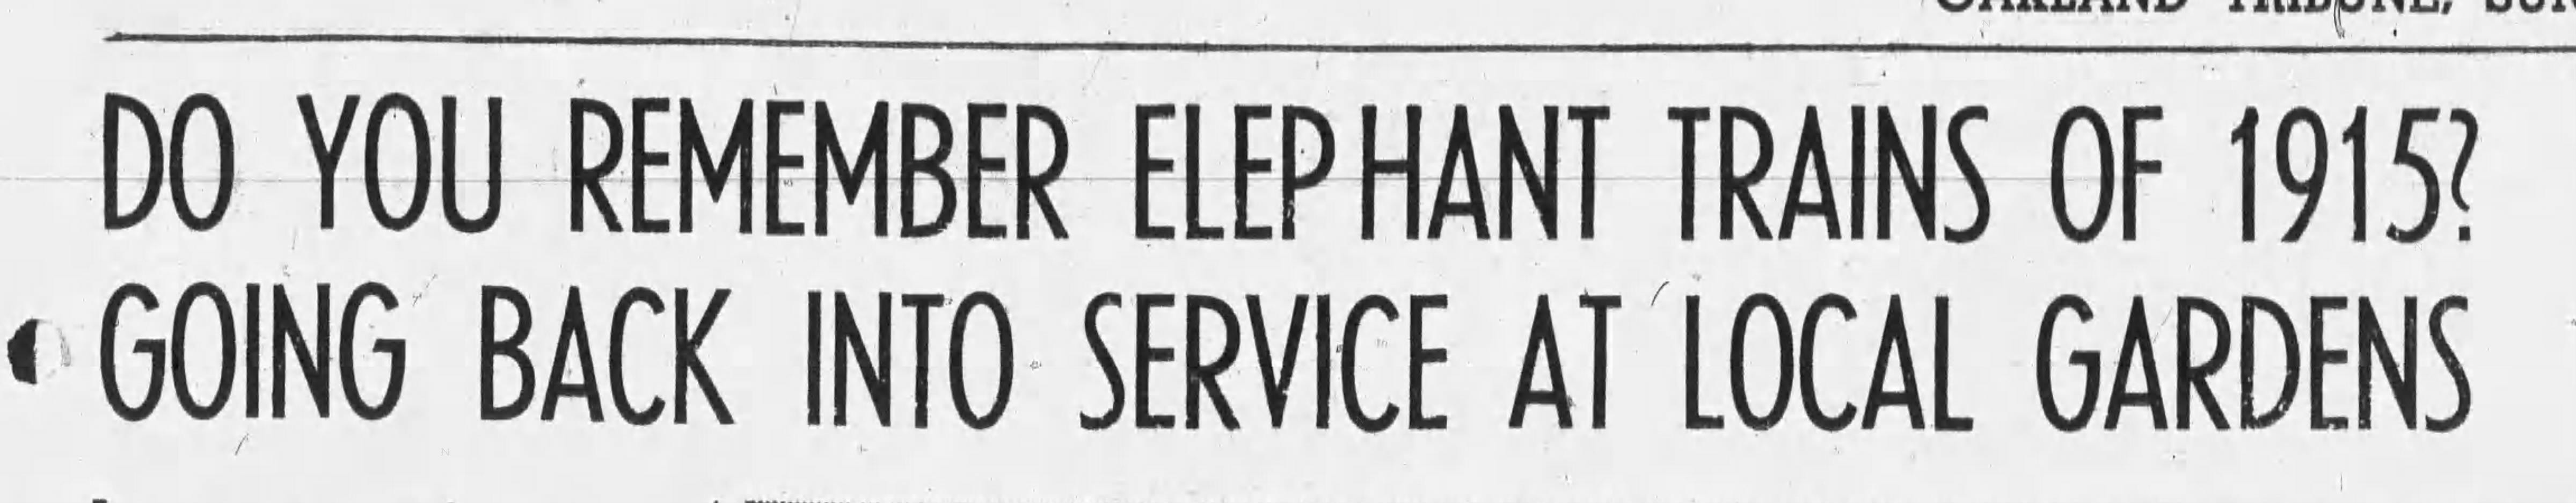 Oakland_Tribune_Sun__Nov_10__1940_